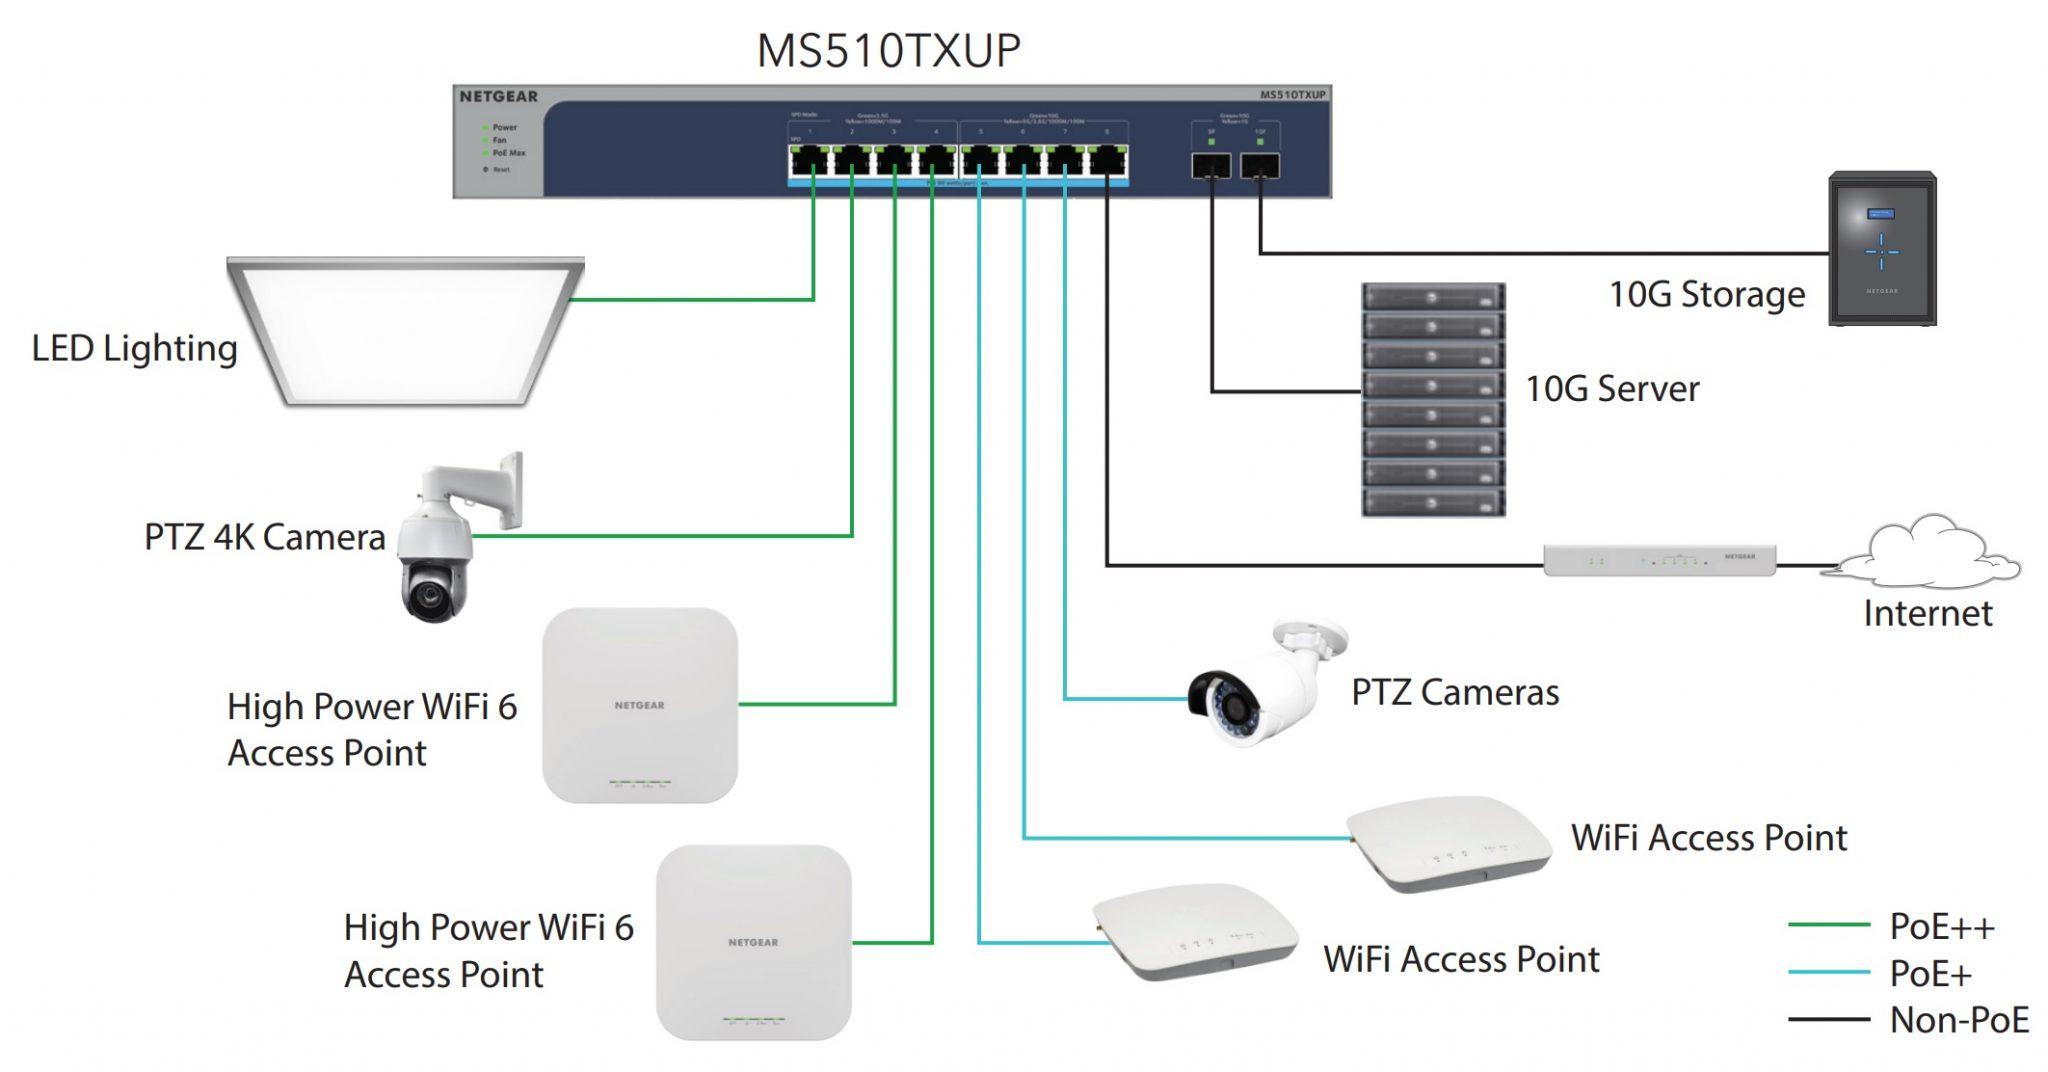 MS510TXUP - säkerhet